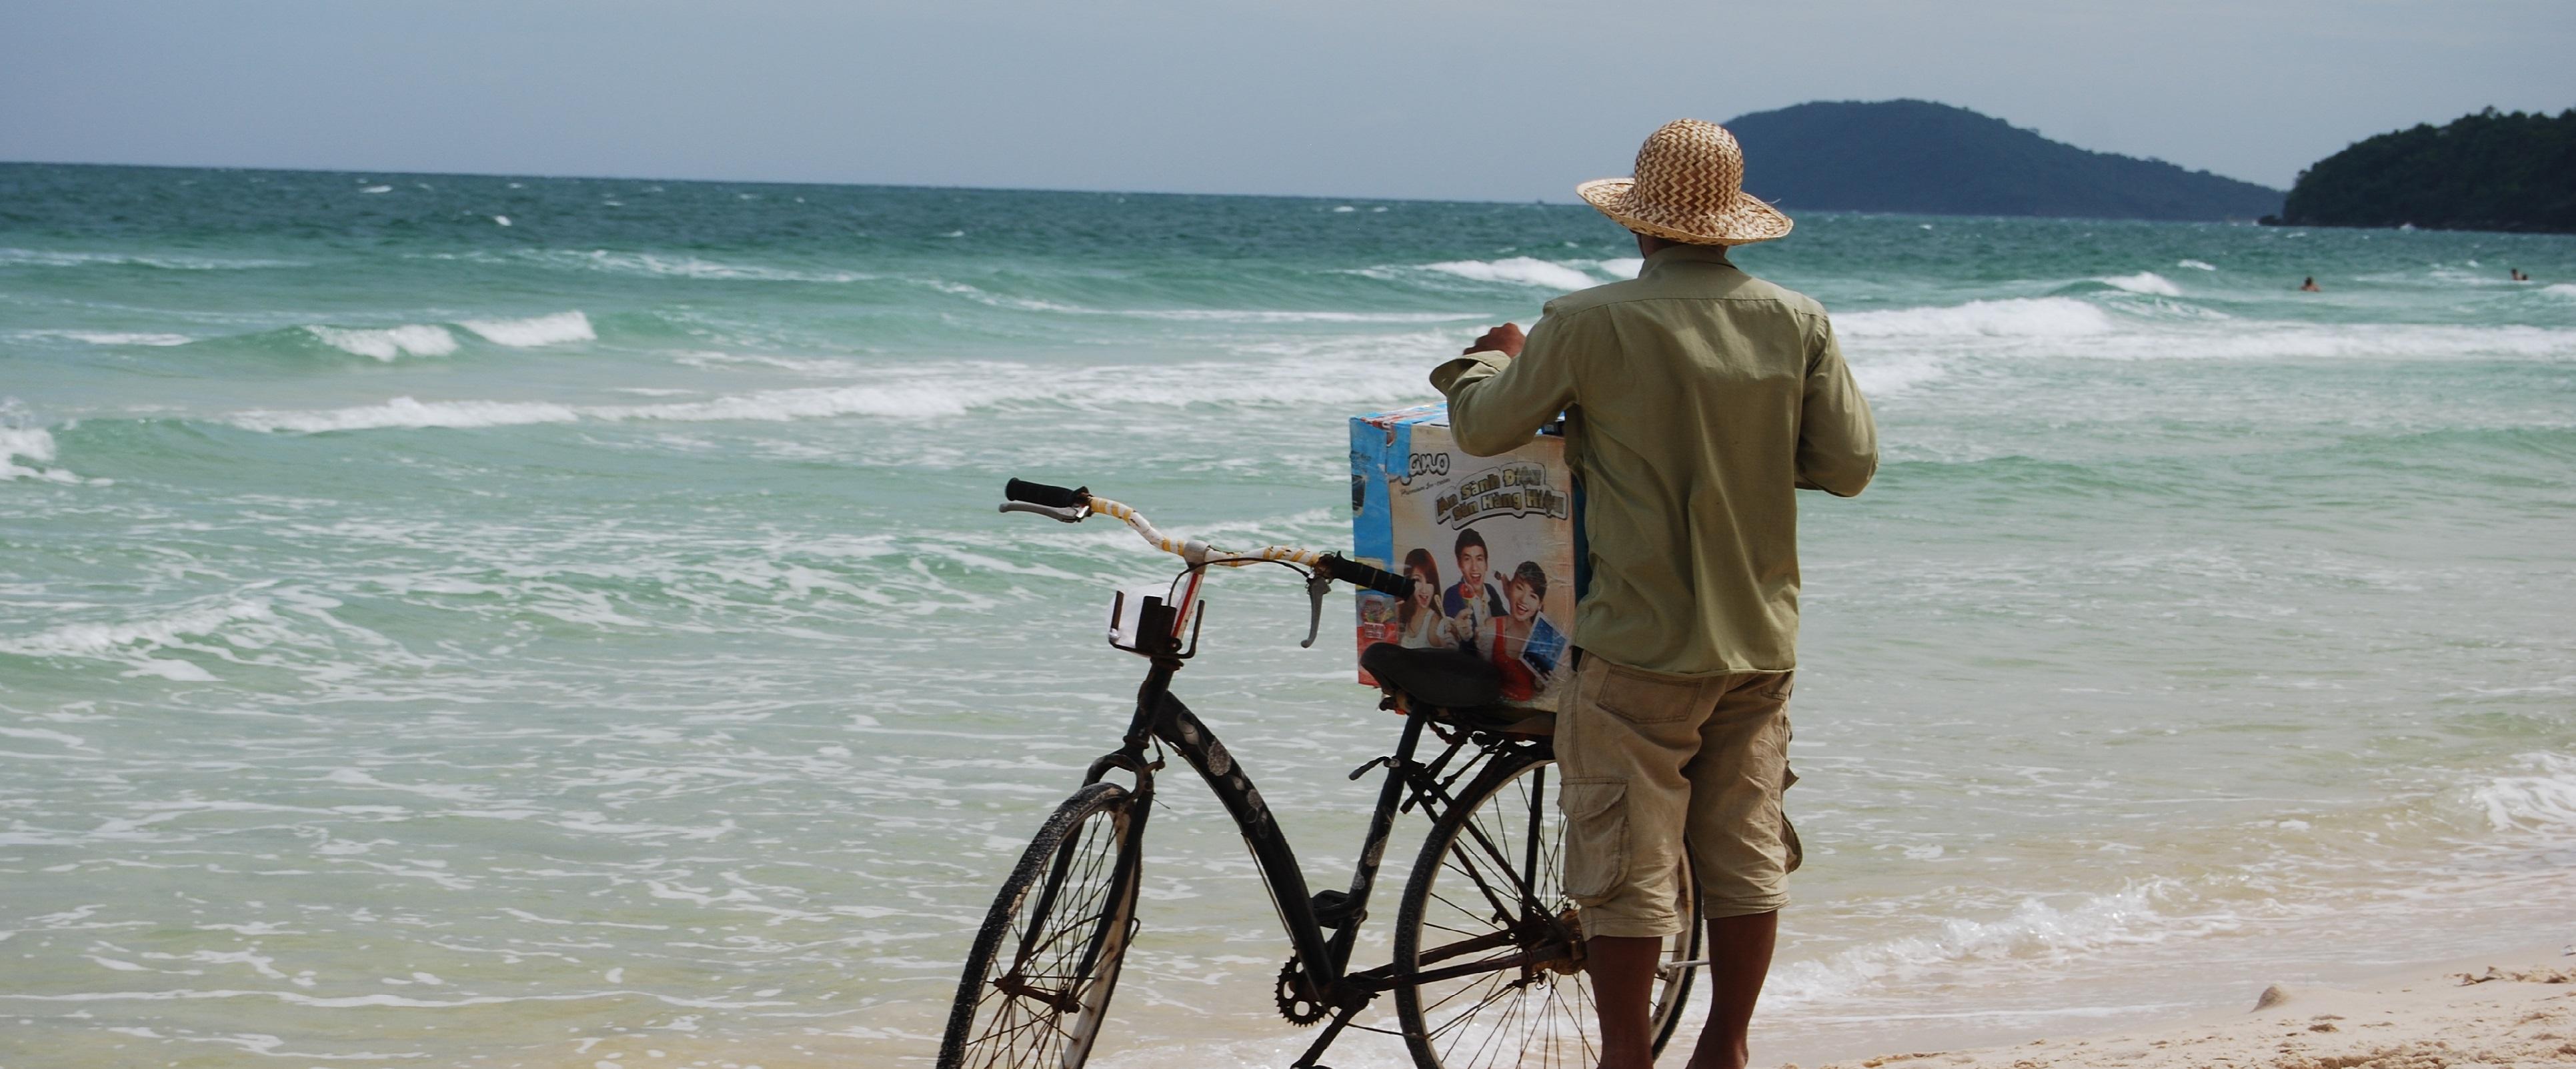 vietnam study abroad study sea